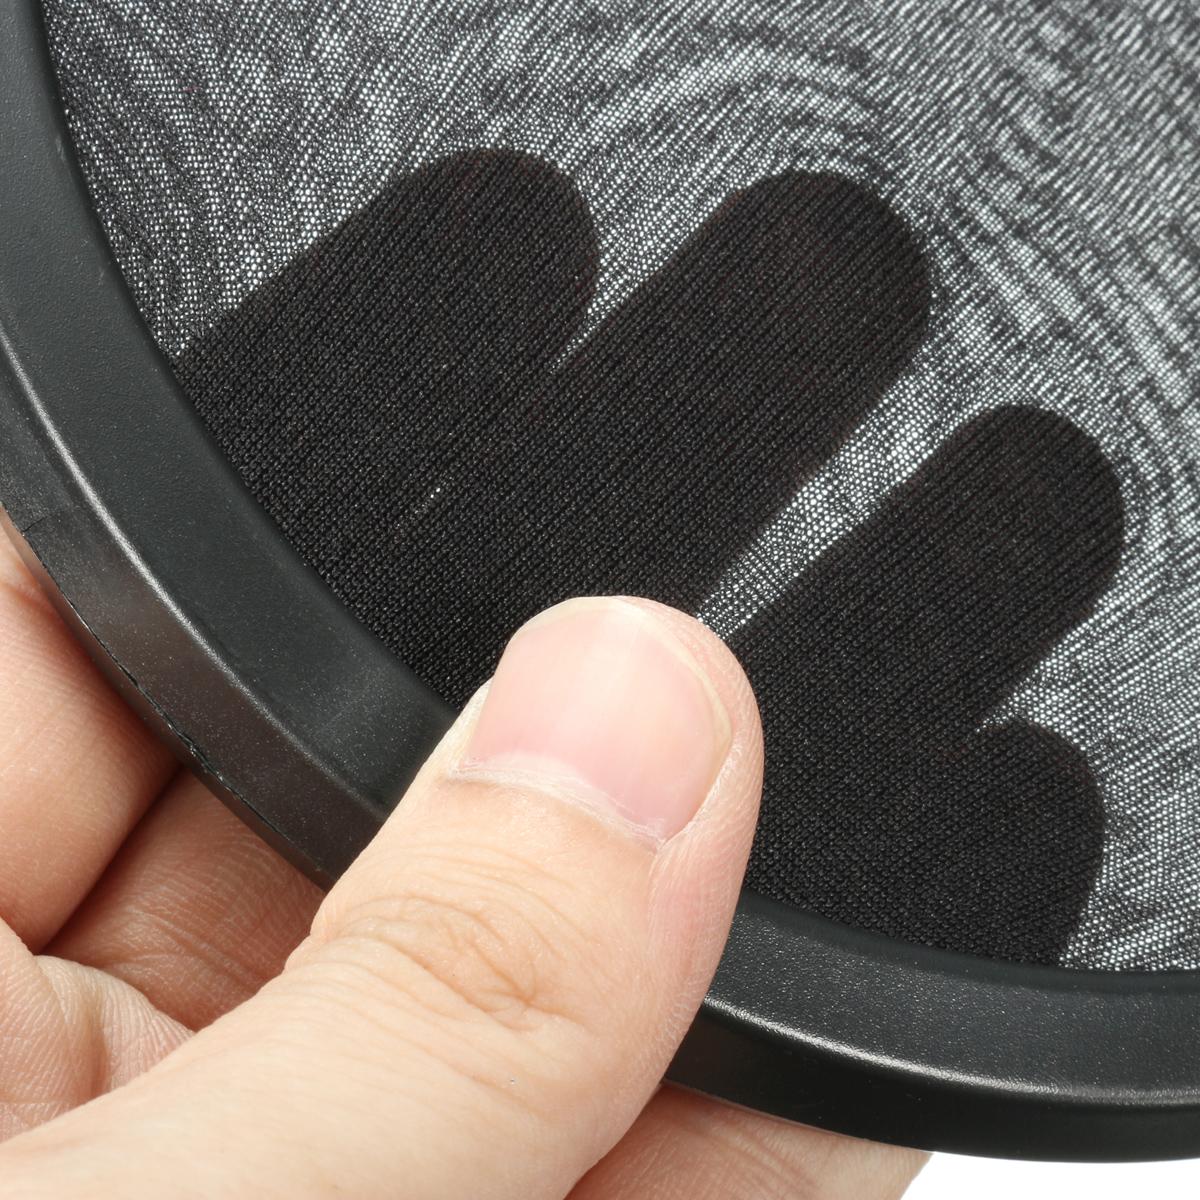 Flexible Dual Double Layer Record Studio Microphone Professional Mic Windscreen Pop Filter Shield